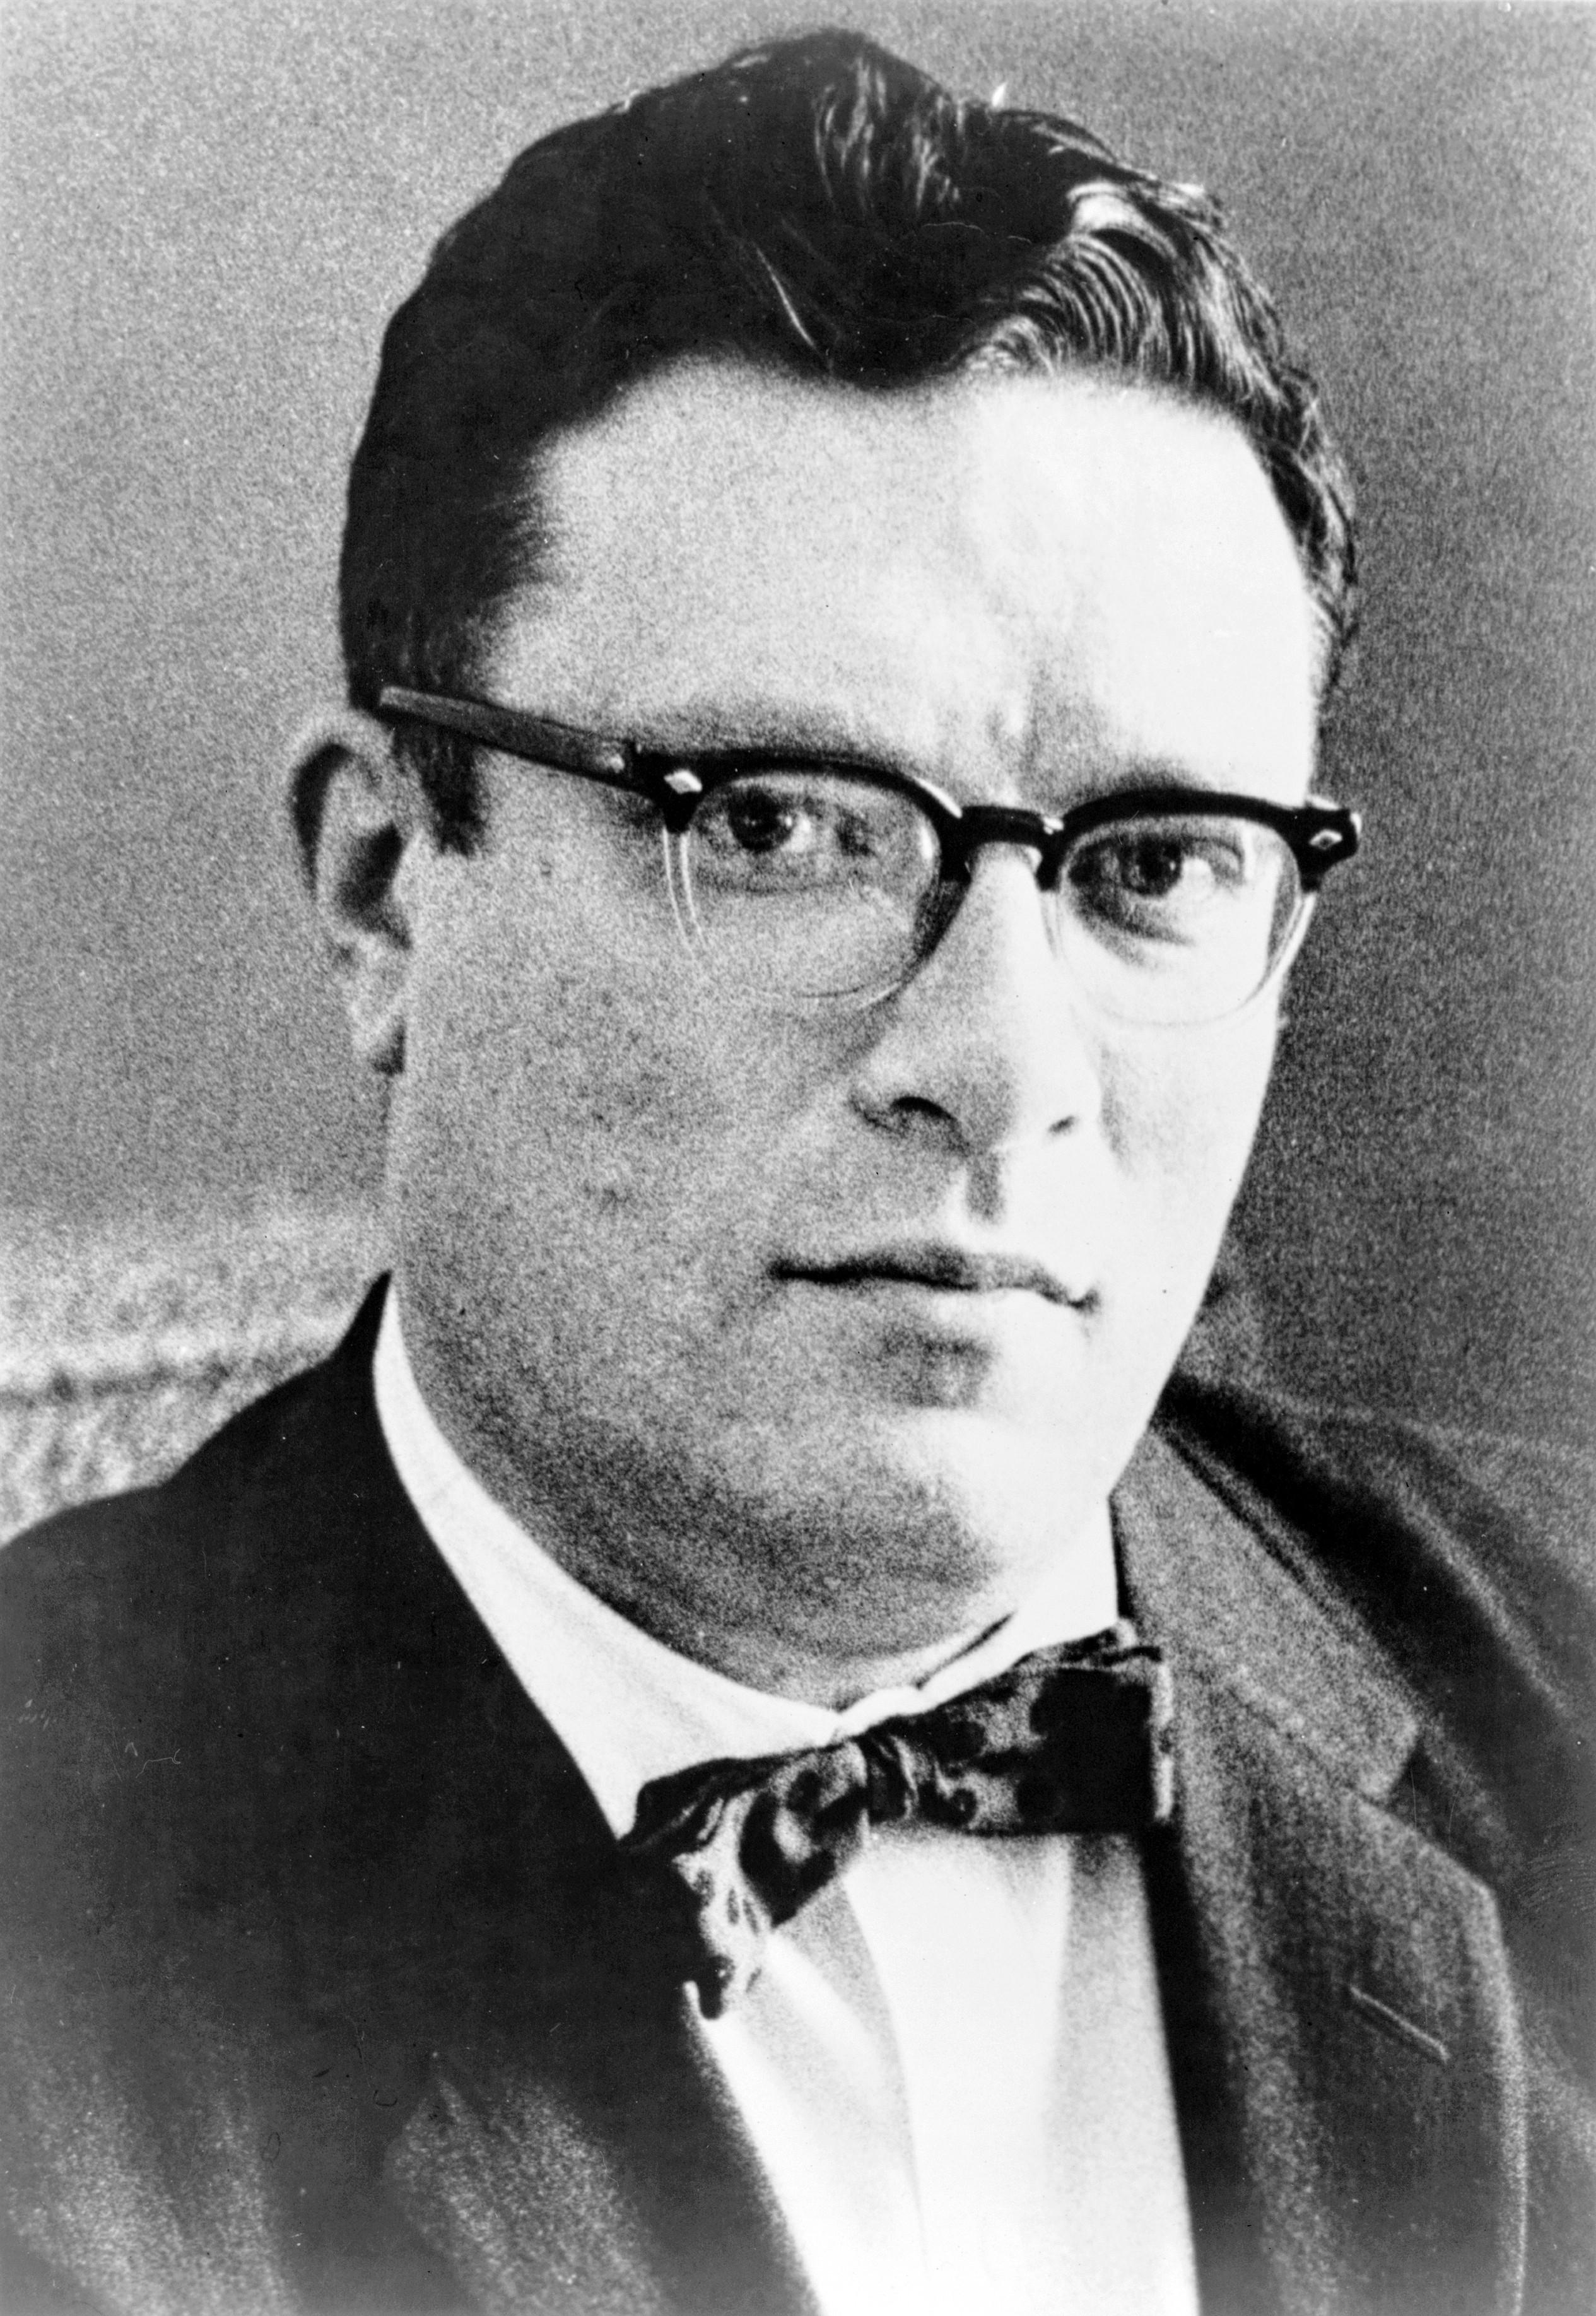 image of Isaac Asimov